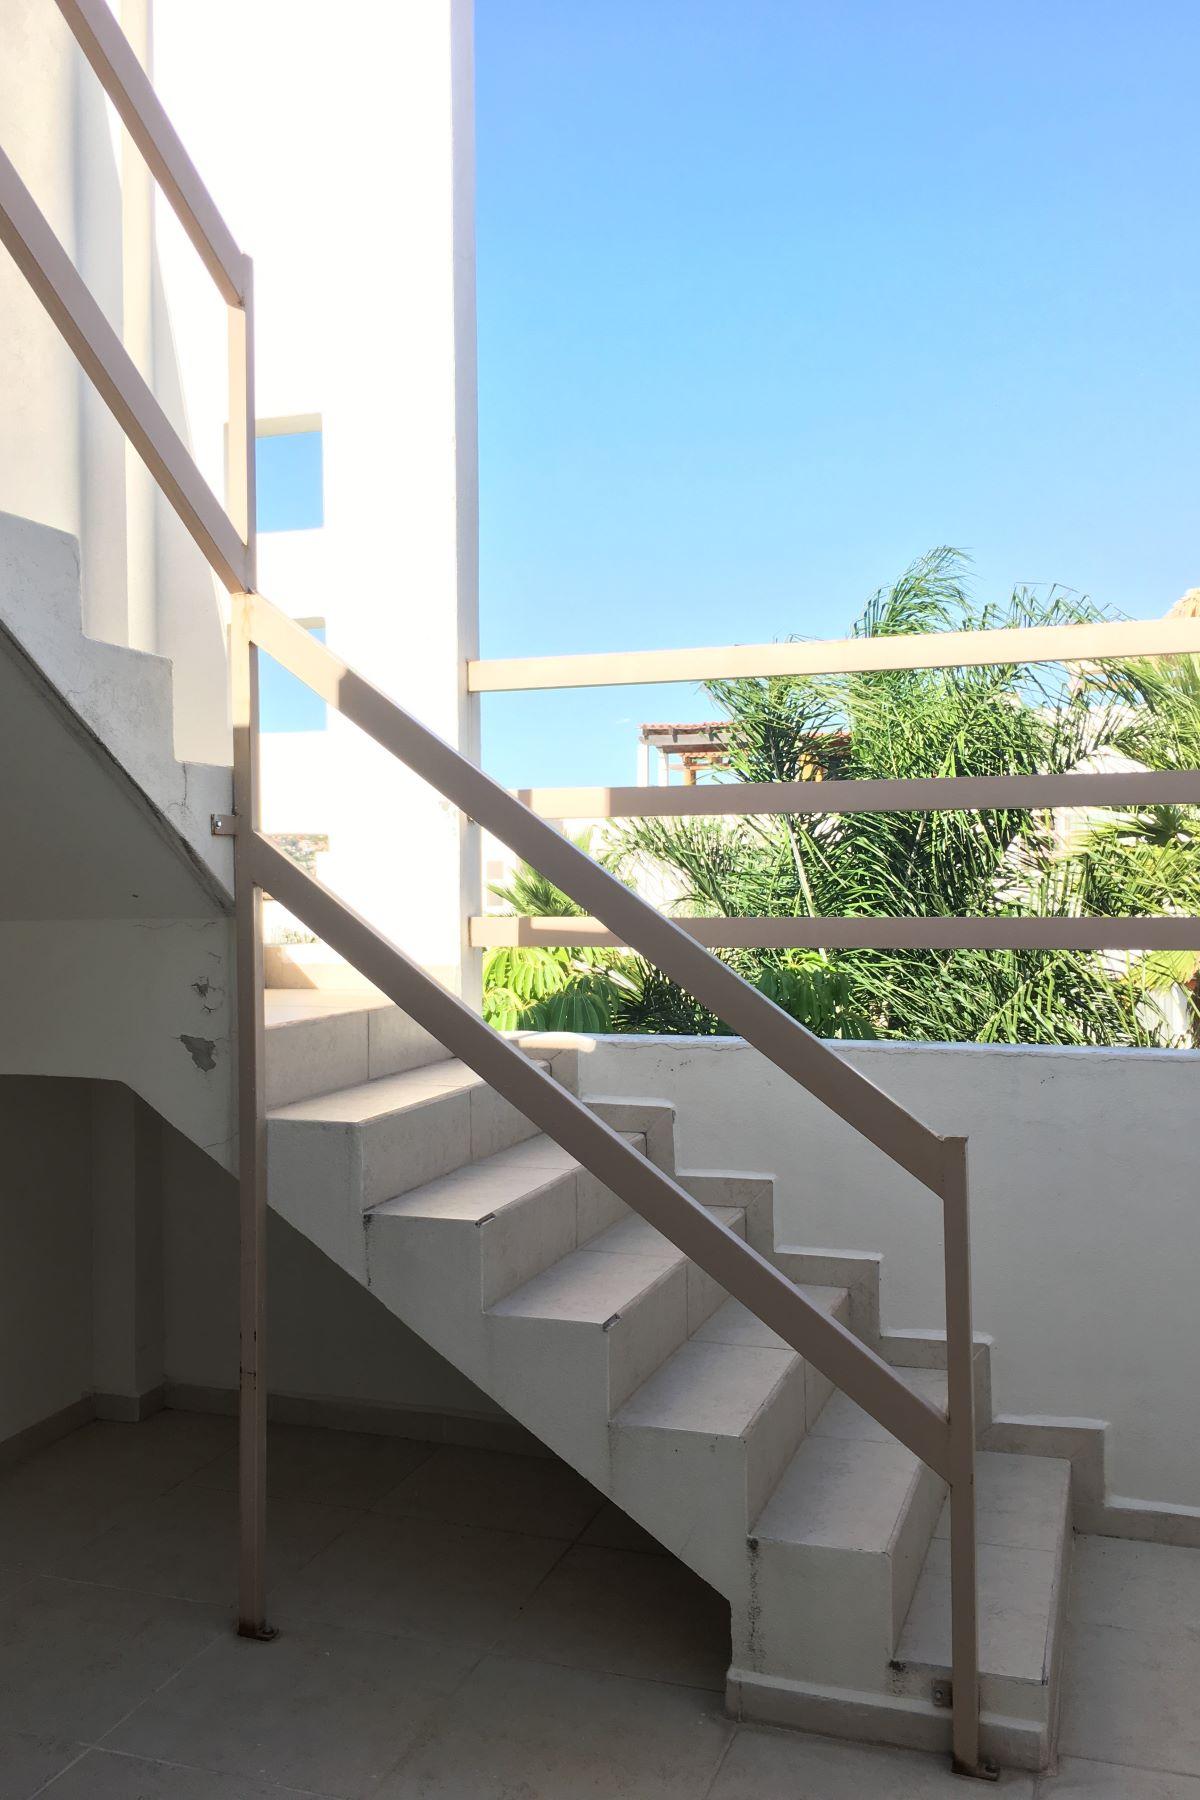 Additional photo for property listing at VISTA MAGNA Vista Magna Unit 30 San Miguel De Allende, Guanajuato 37755 Mexico